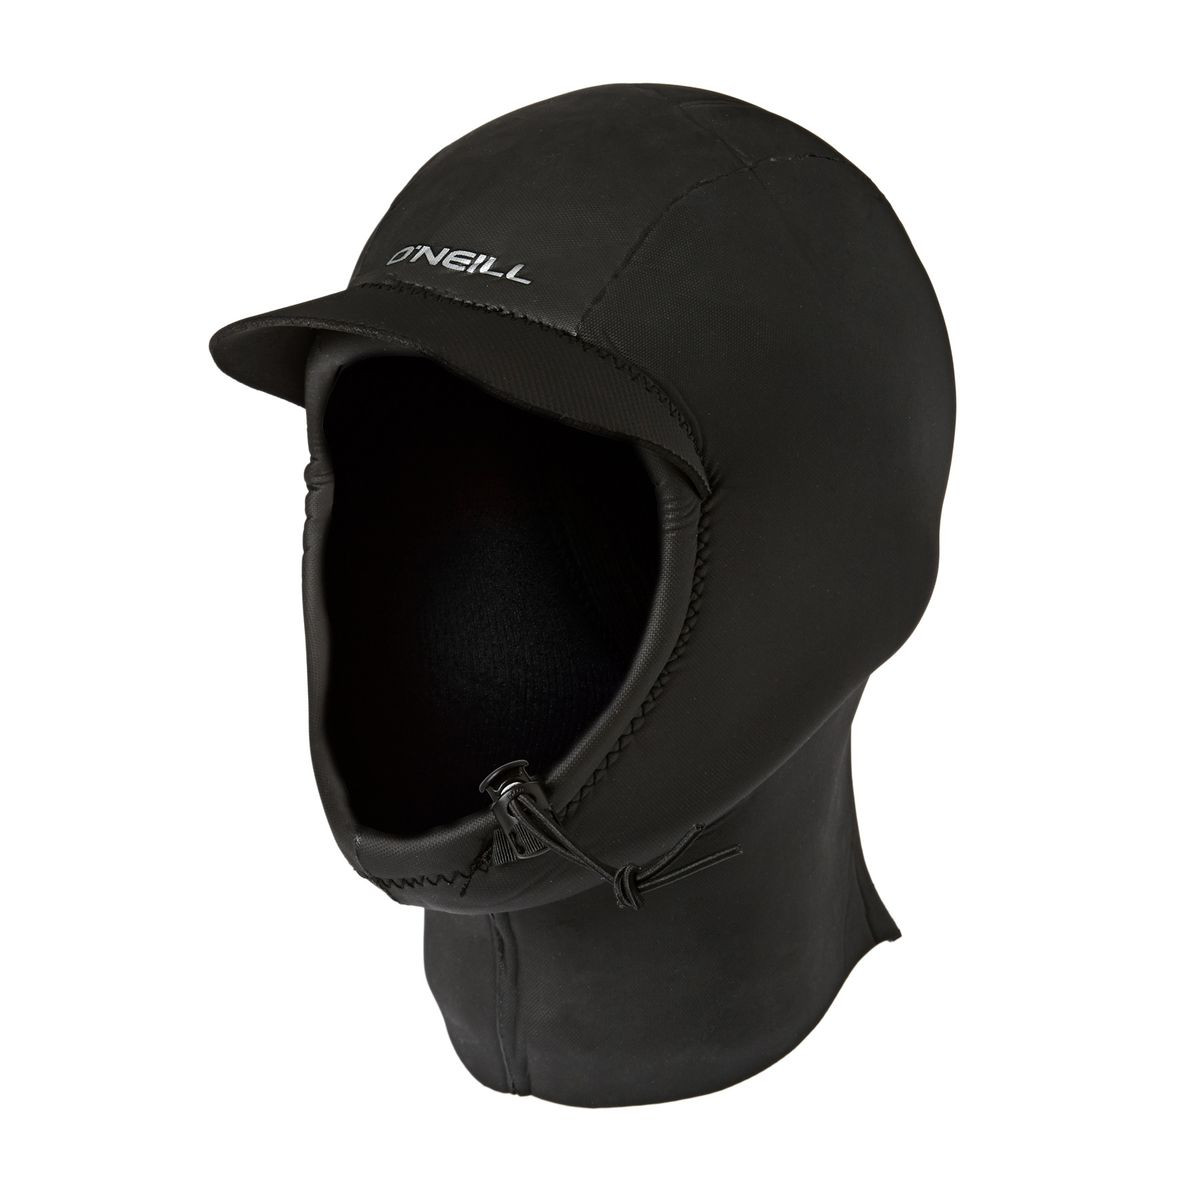 O'Neill 3mm Hyperfreak Coldwater Wetsuit Hood - Black